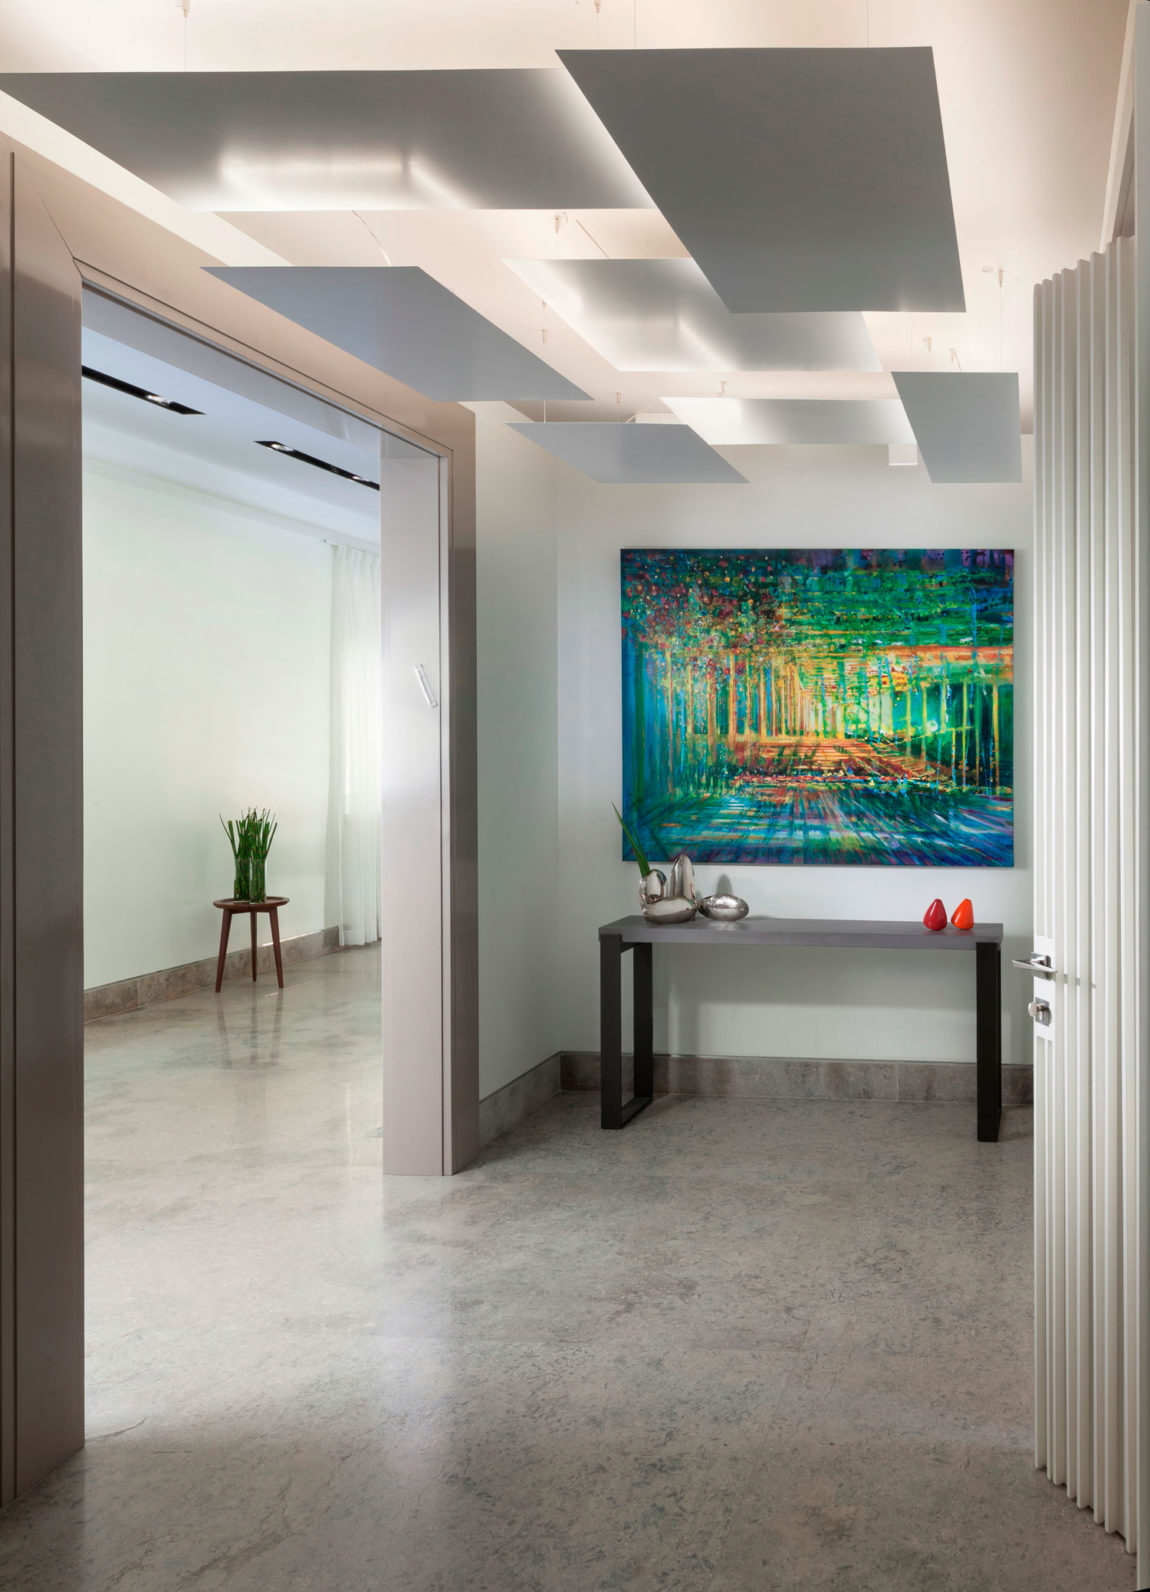 Modern Garden Apartment by Annette Frommer (1)